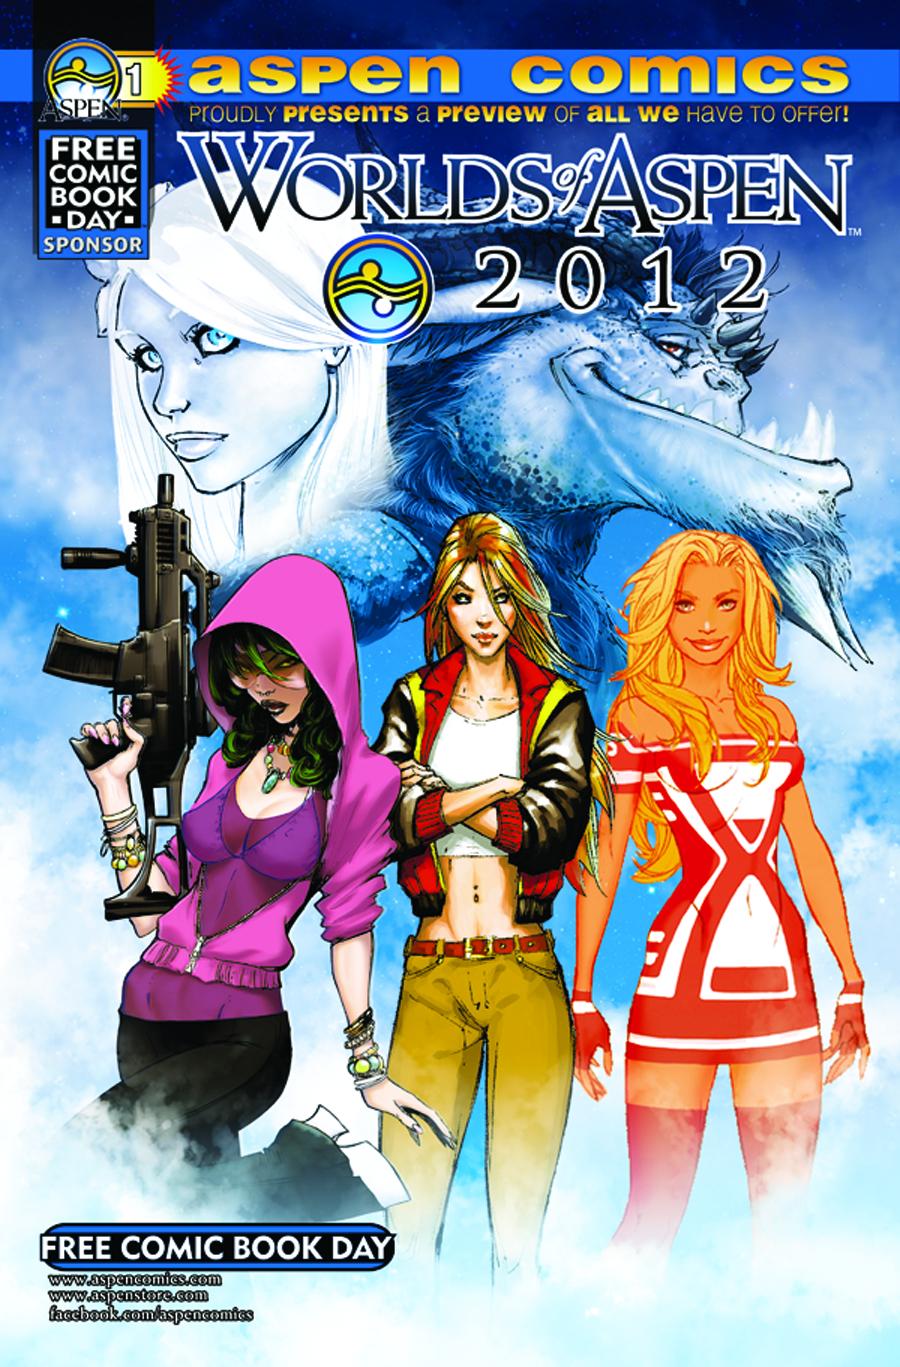 STK460021 Free Comic Book Day 2012: Reviews!